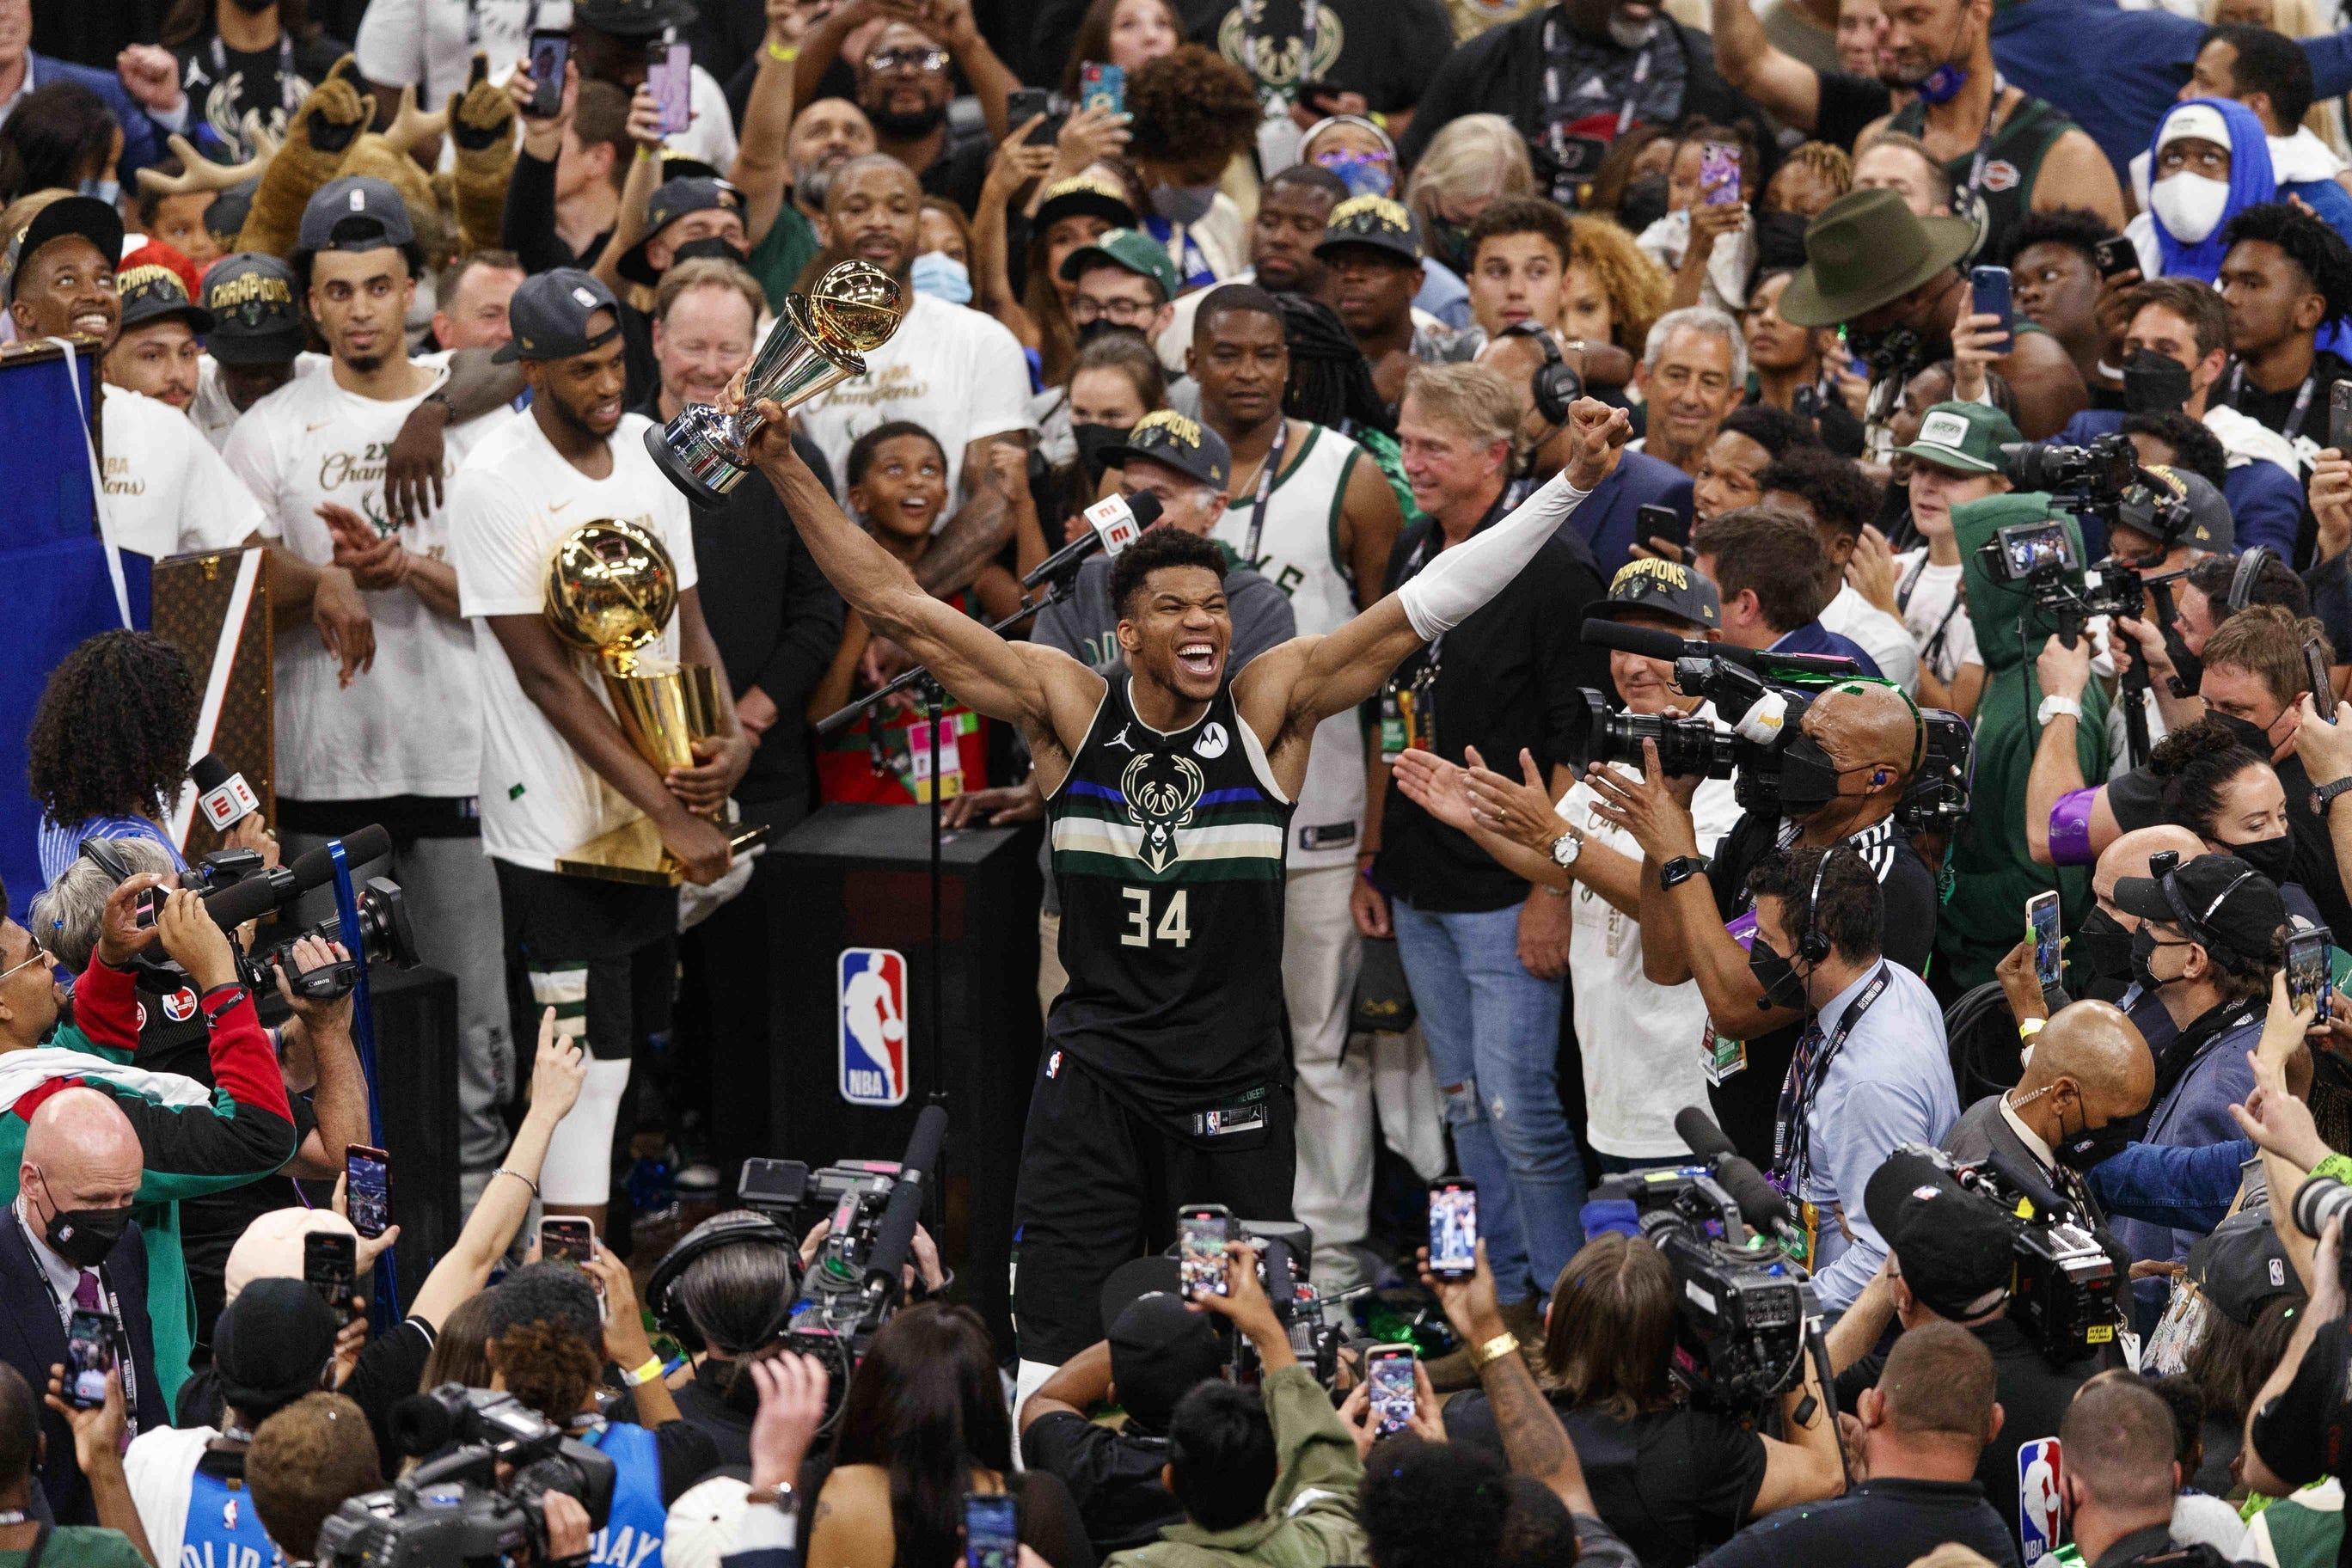 The Milwaukee Bucks are NBA Champs!